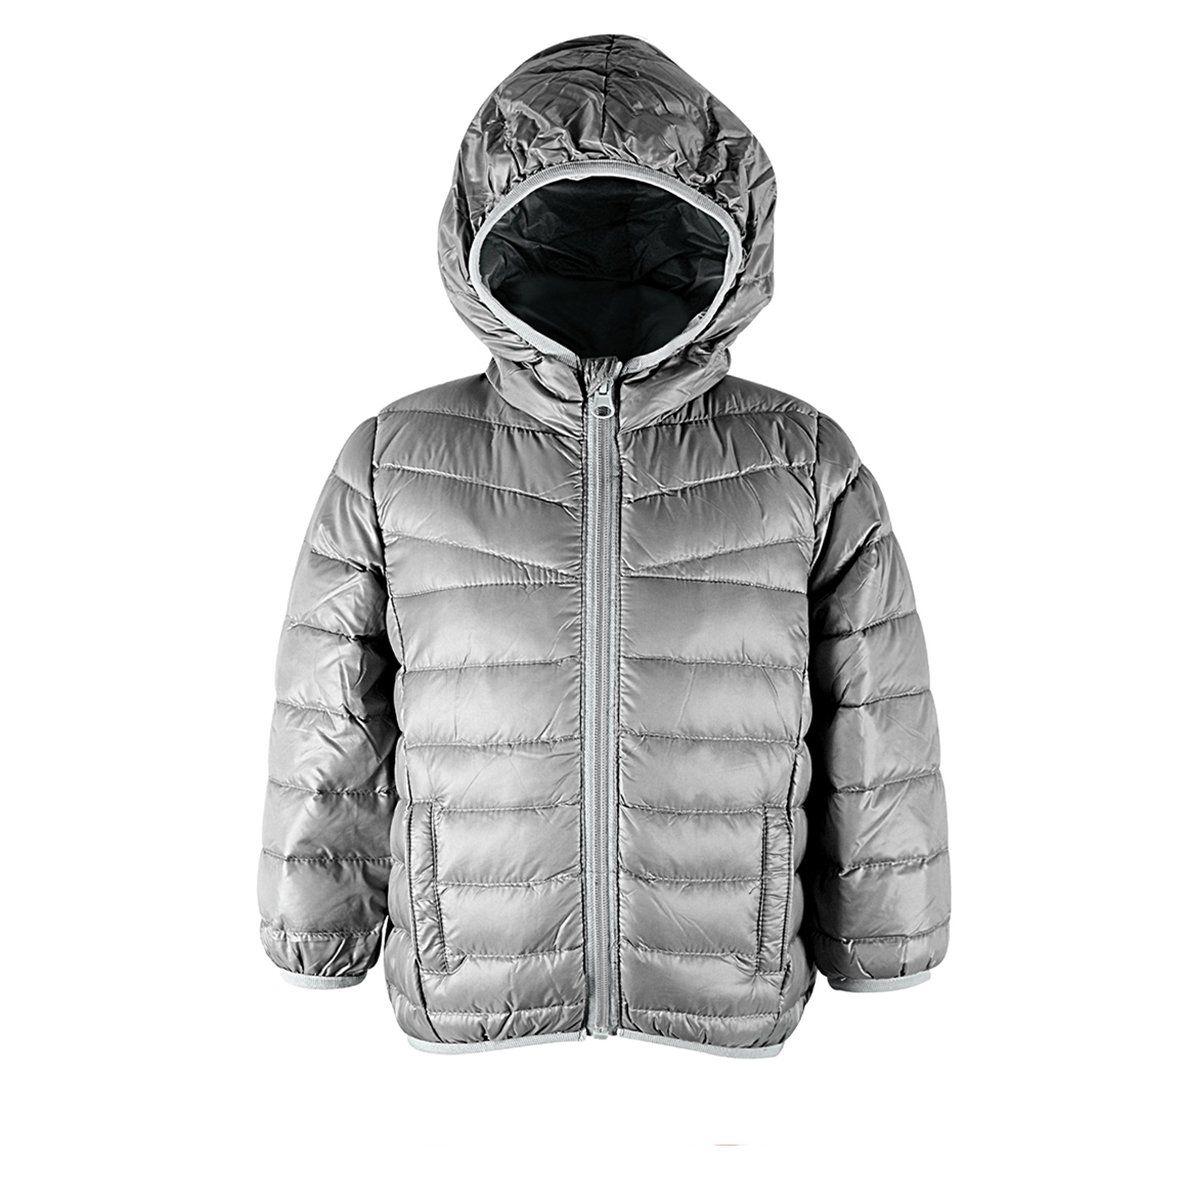 Durio Boy Kids Hooded Solid Down Coat Winter Packable Puffer Coat For Children Warm Soft Jacket Heather Grey Beige Girls Jacket Zipper Outerwear Soft Jacket [ 1200 x 1200 Pixel ]